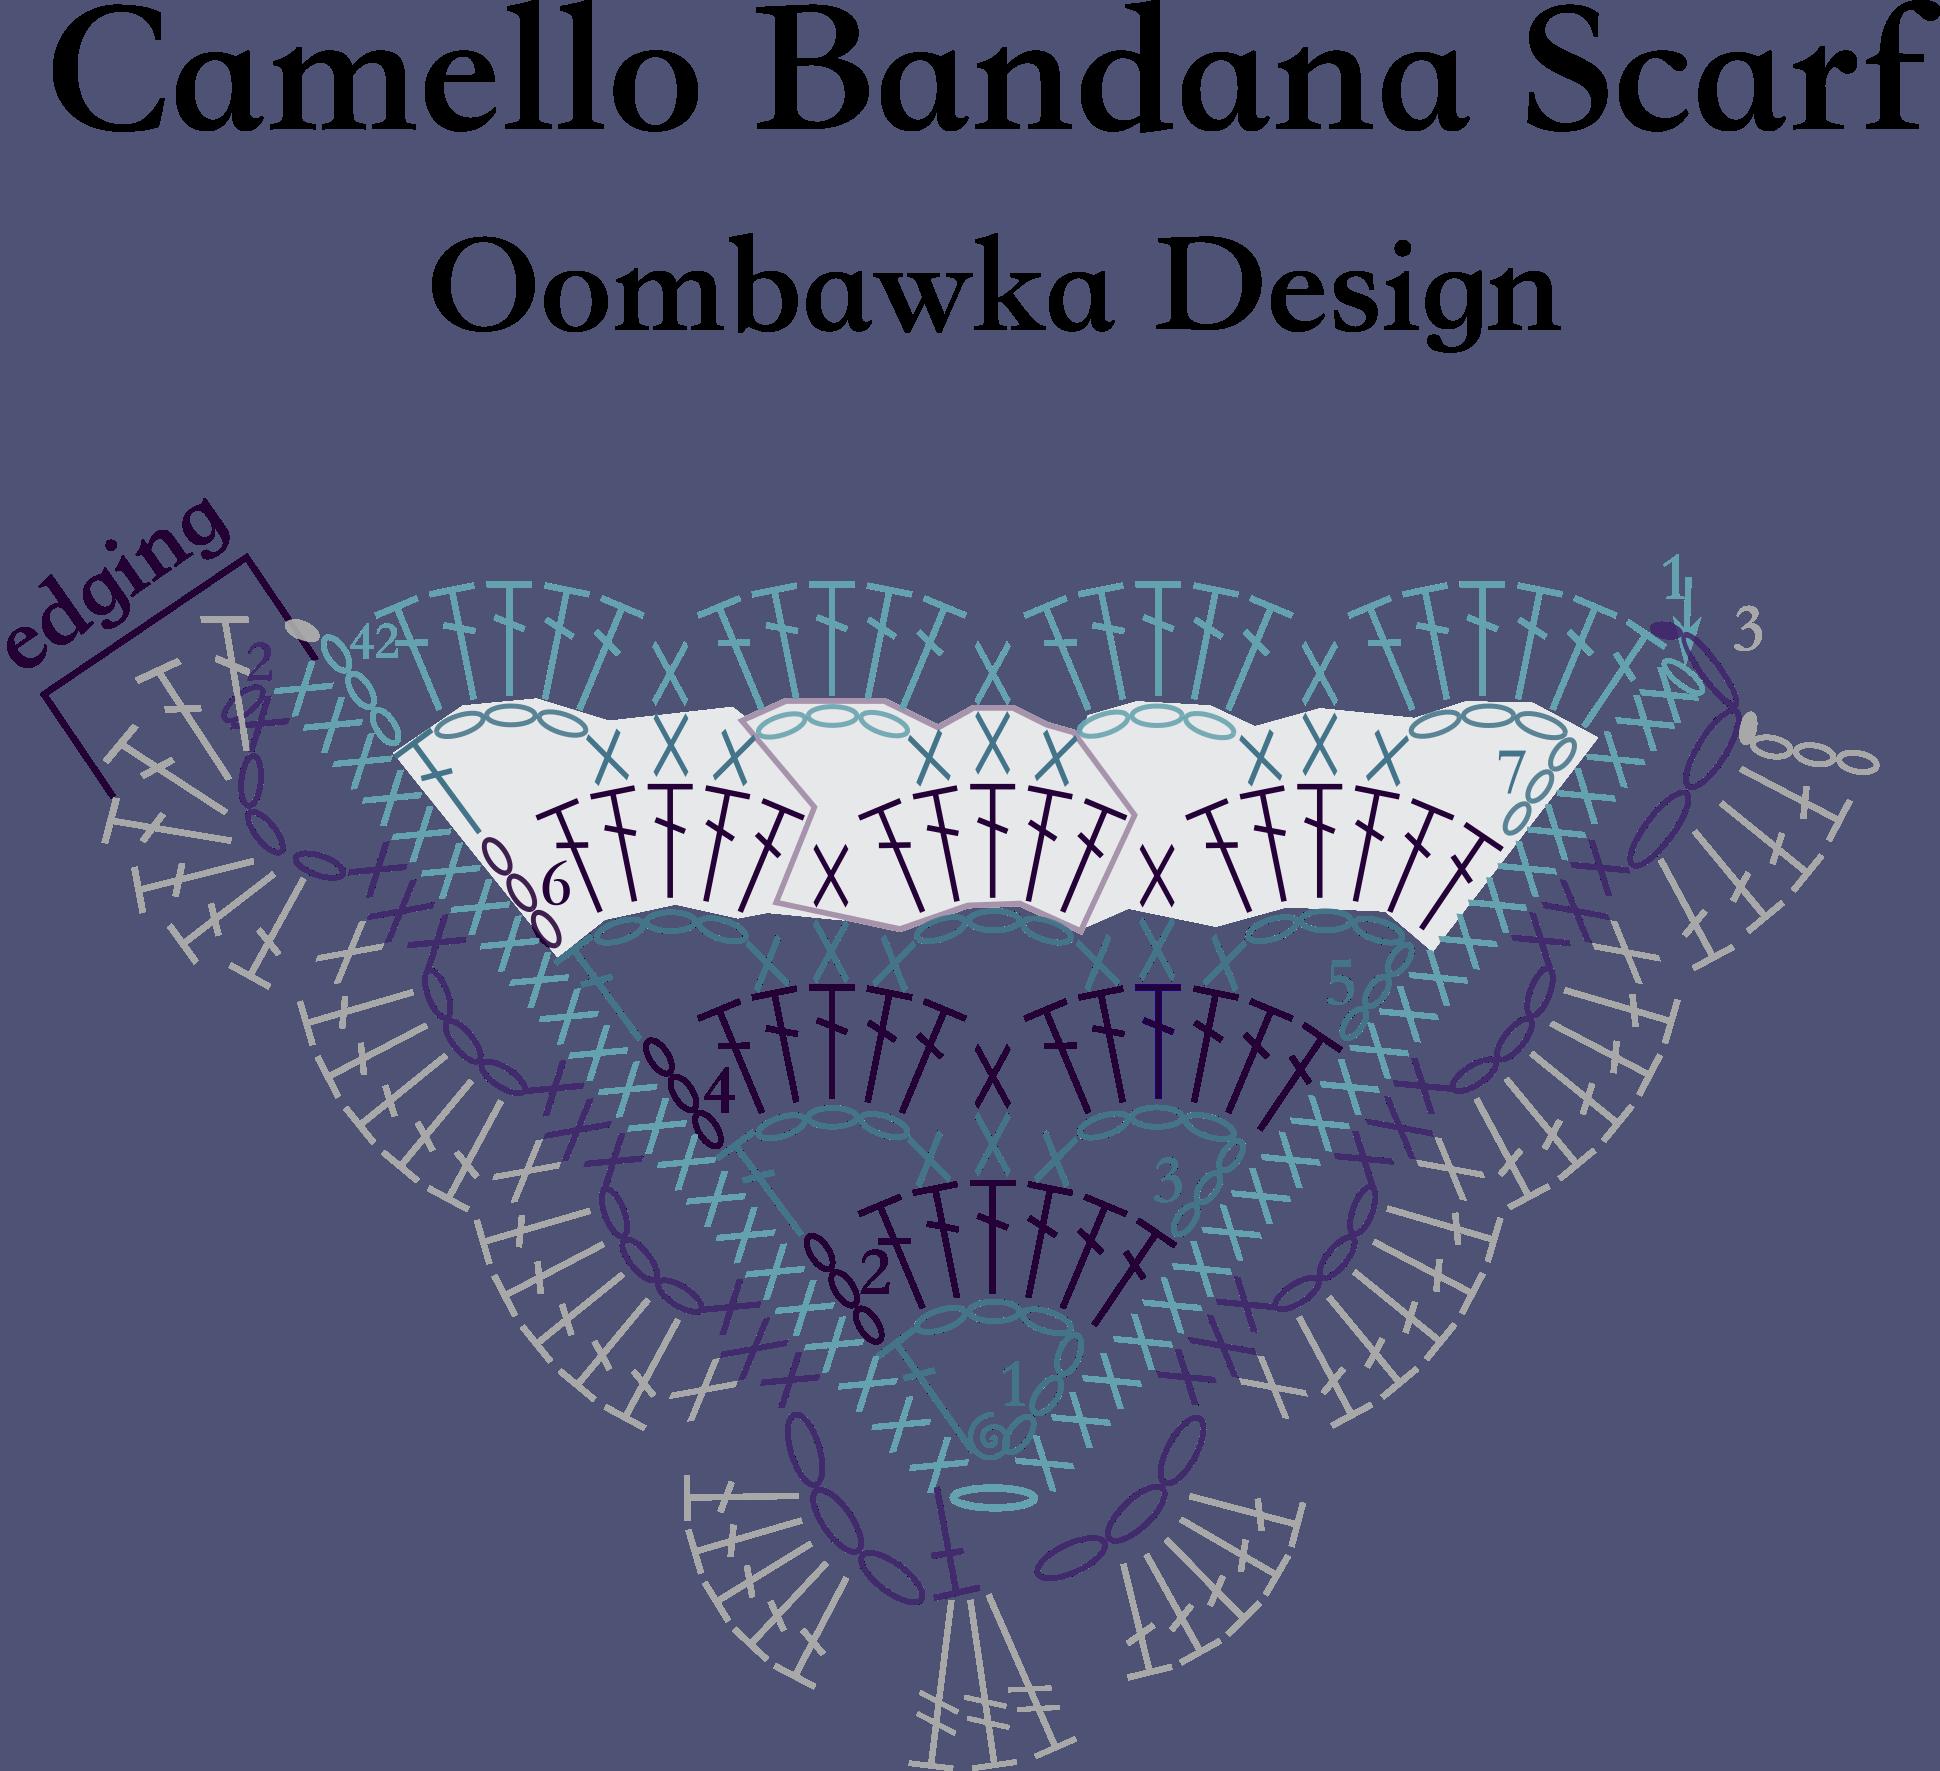 Crochet by Rhondda - Oombawka Design Crochet - Camello Bandana Scarf_diagram - ODC